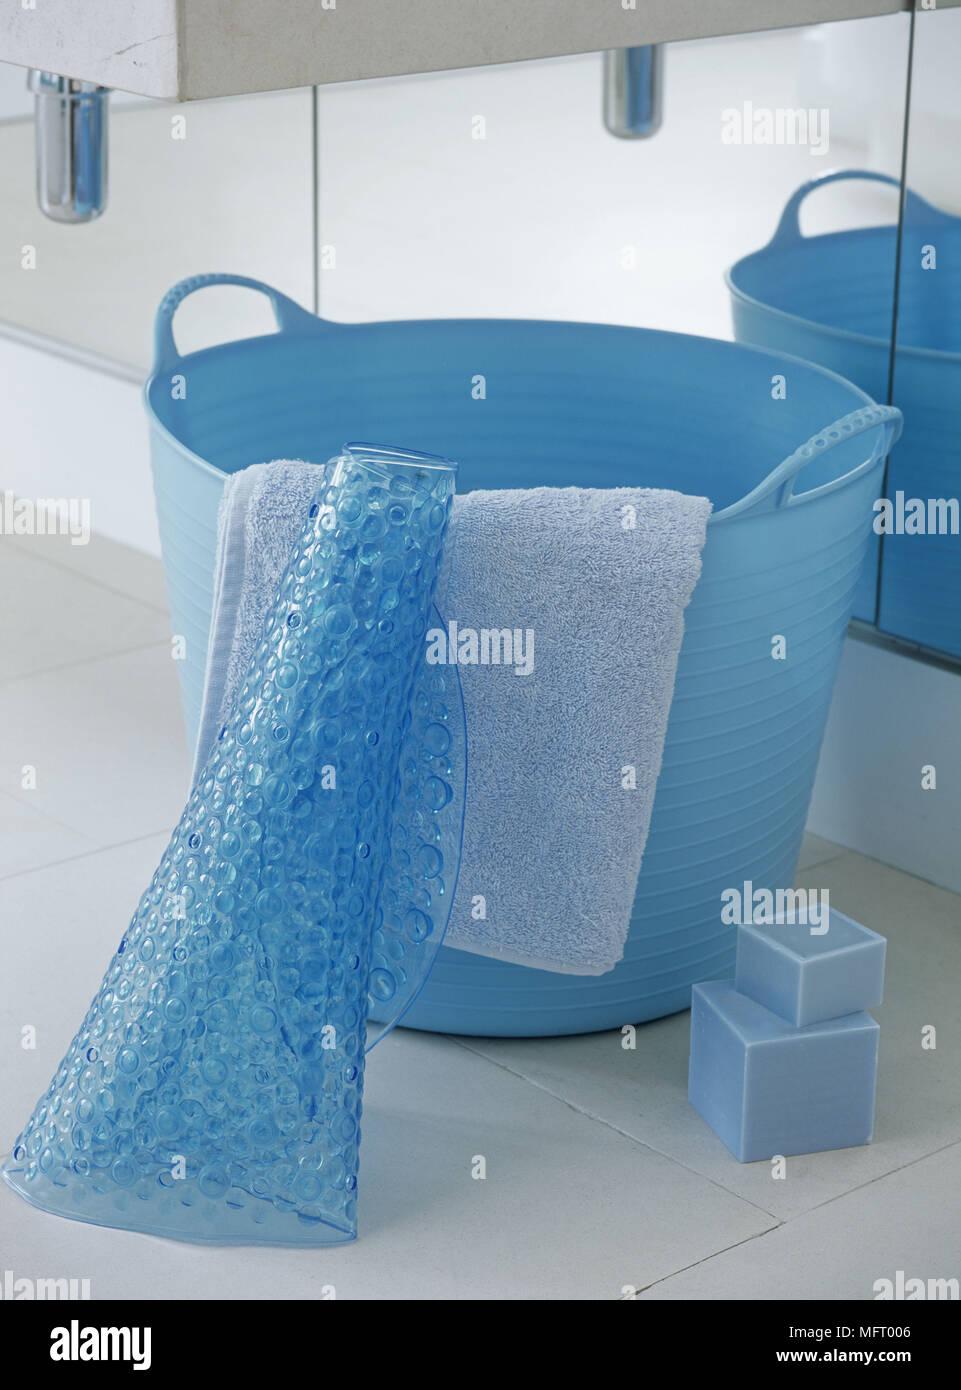 Blue plastic bucket with bath matt and soaps Stock Photo: 181850374 ...